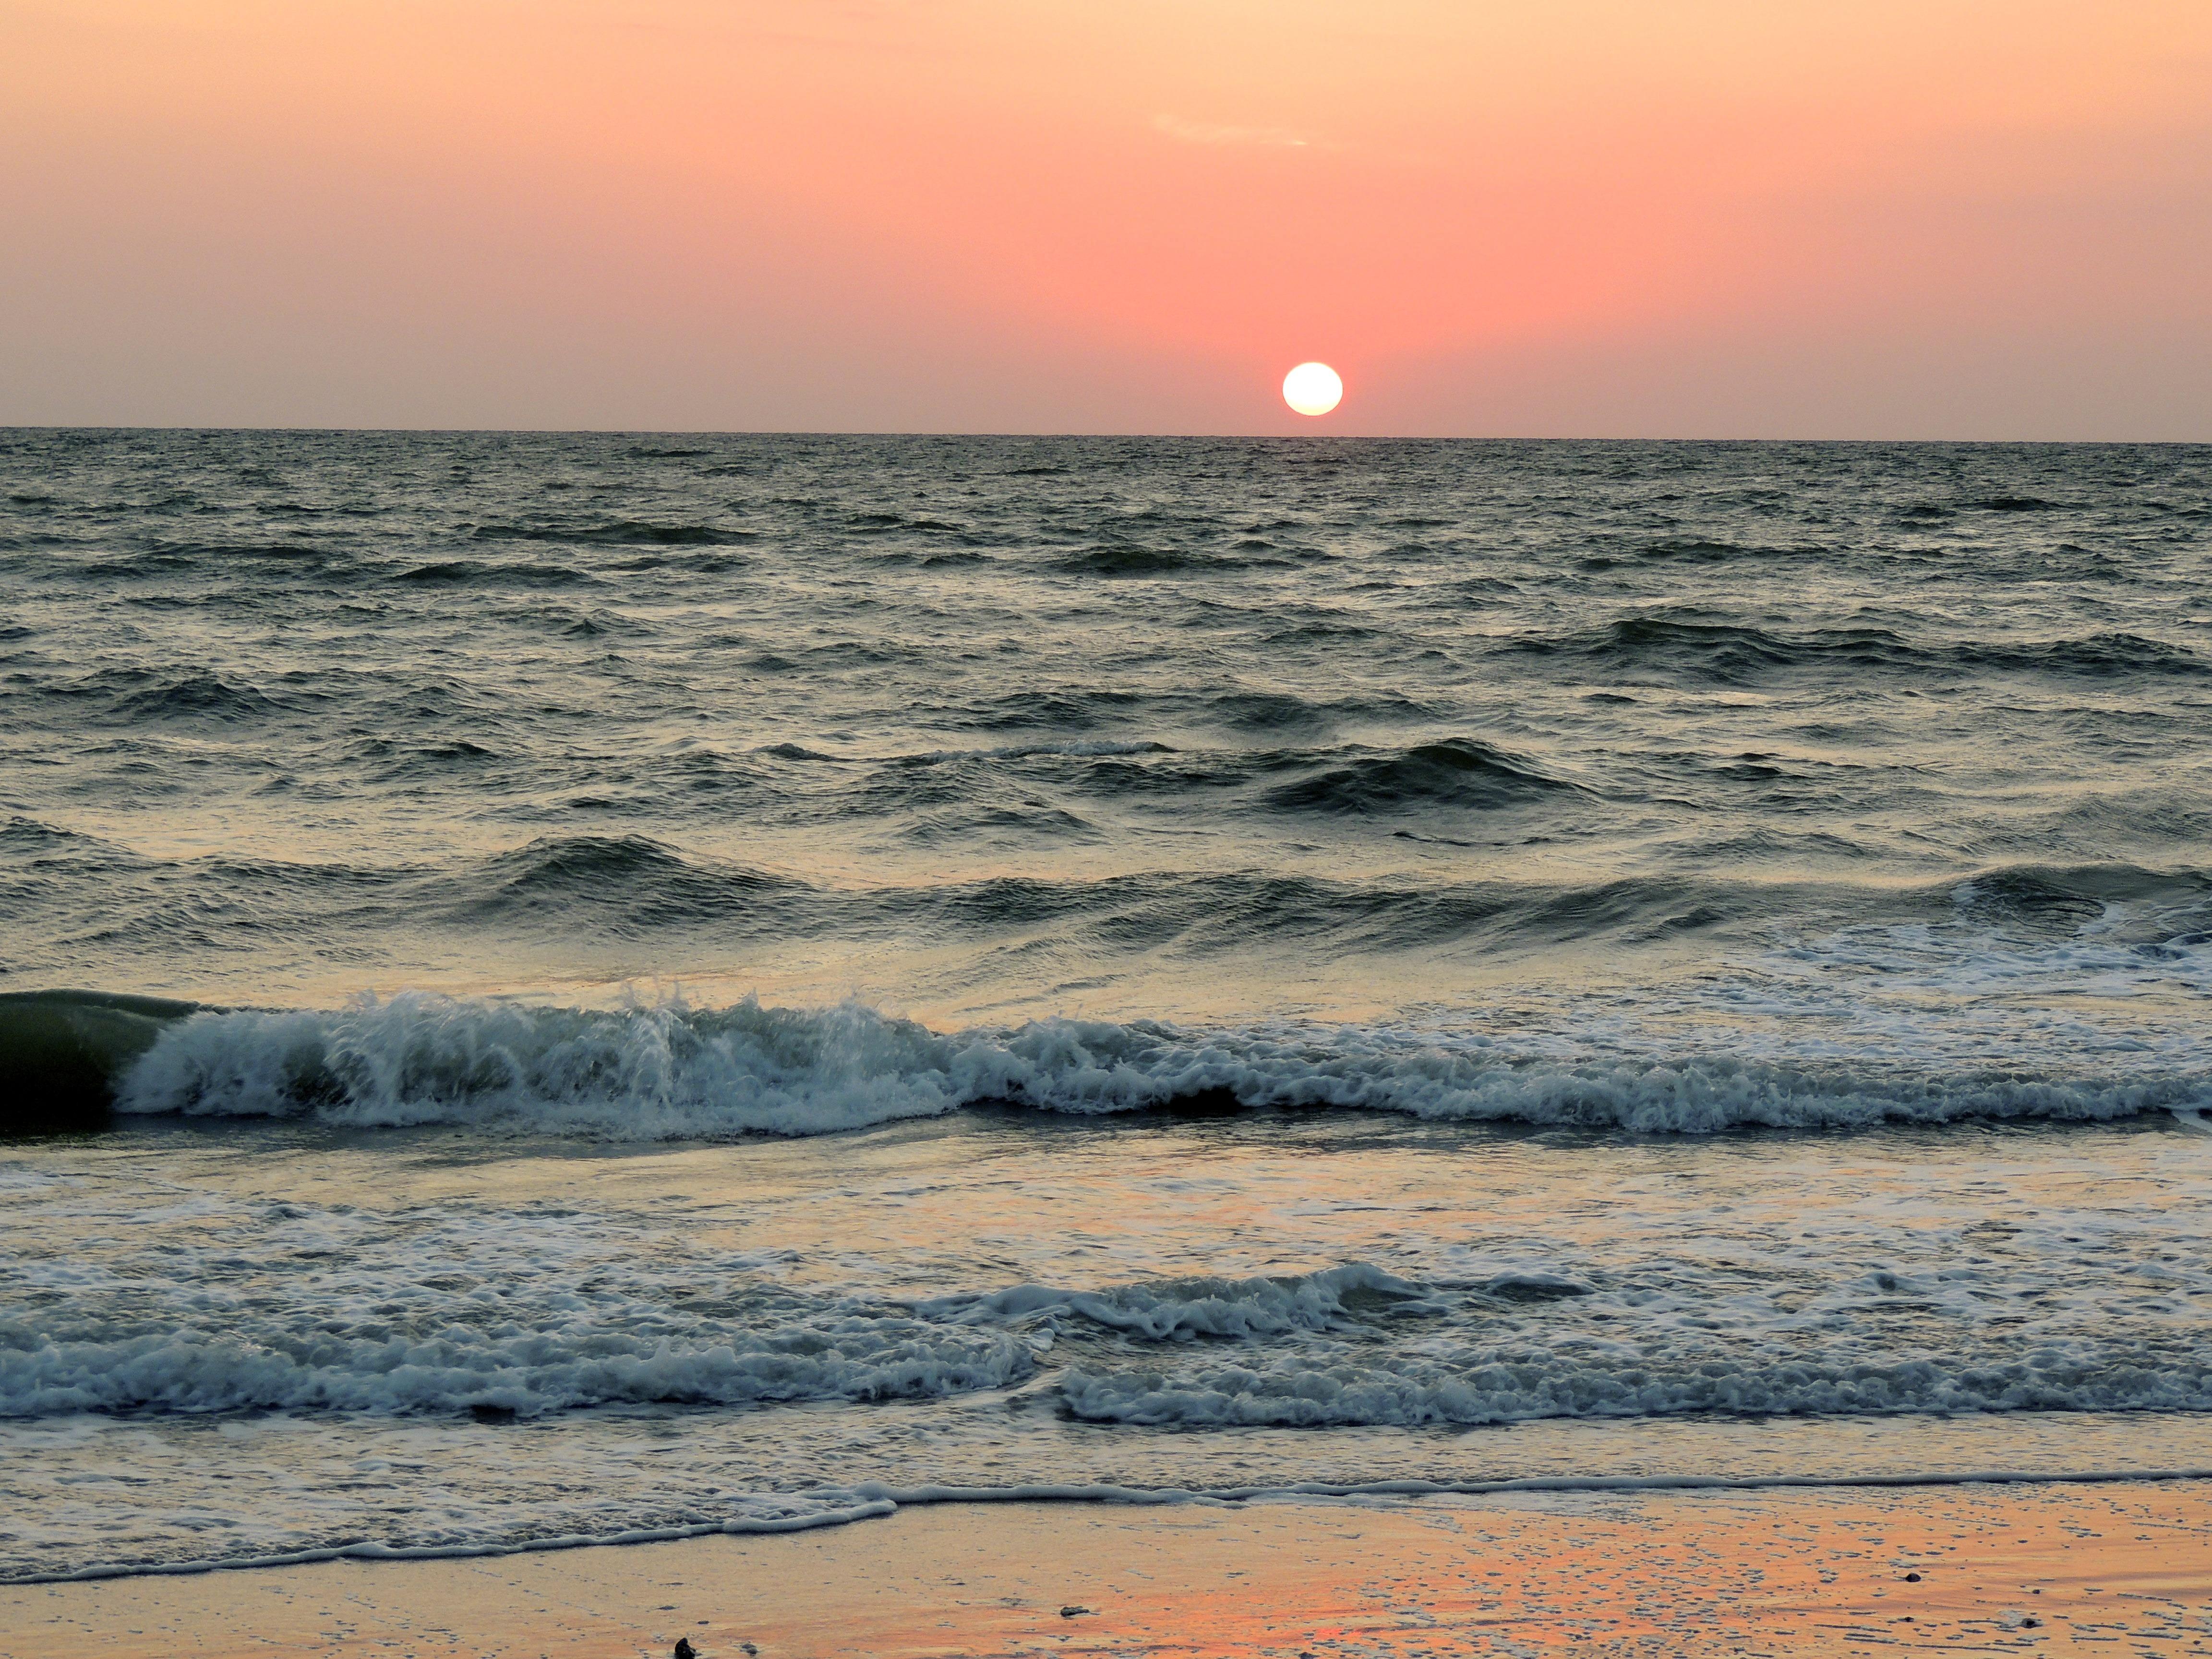 Beach Sea Coast Nature Sand Ocean Horizon Sky Sun Sunrise Sunset Sunlight Morning S Wave Dawn